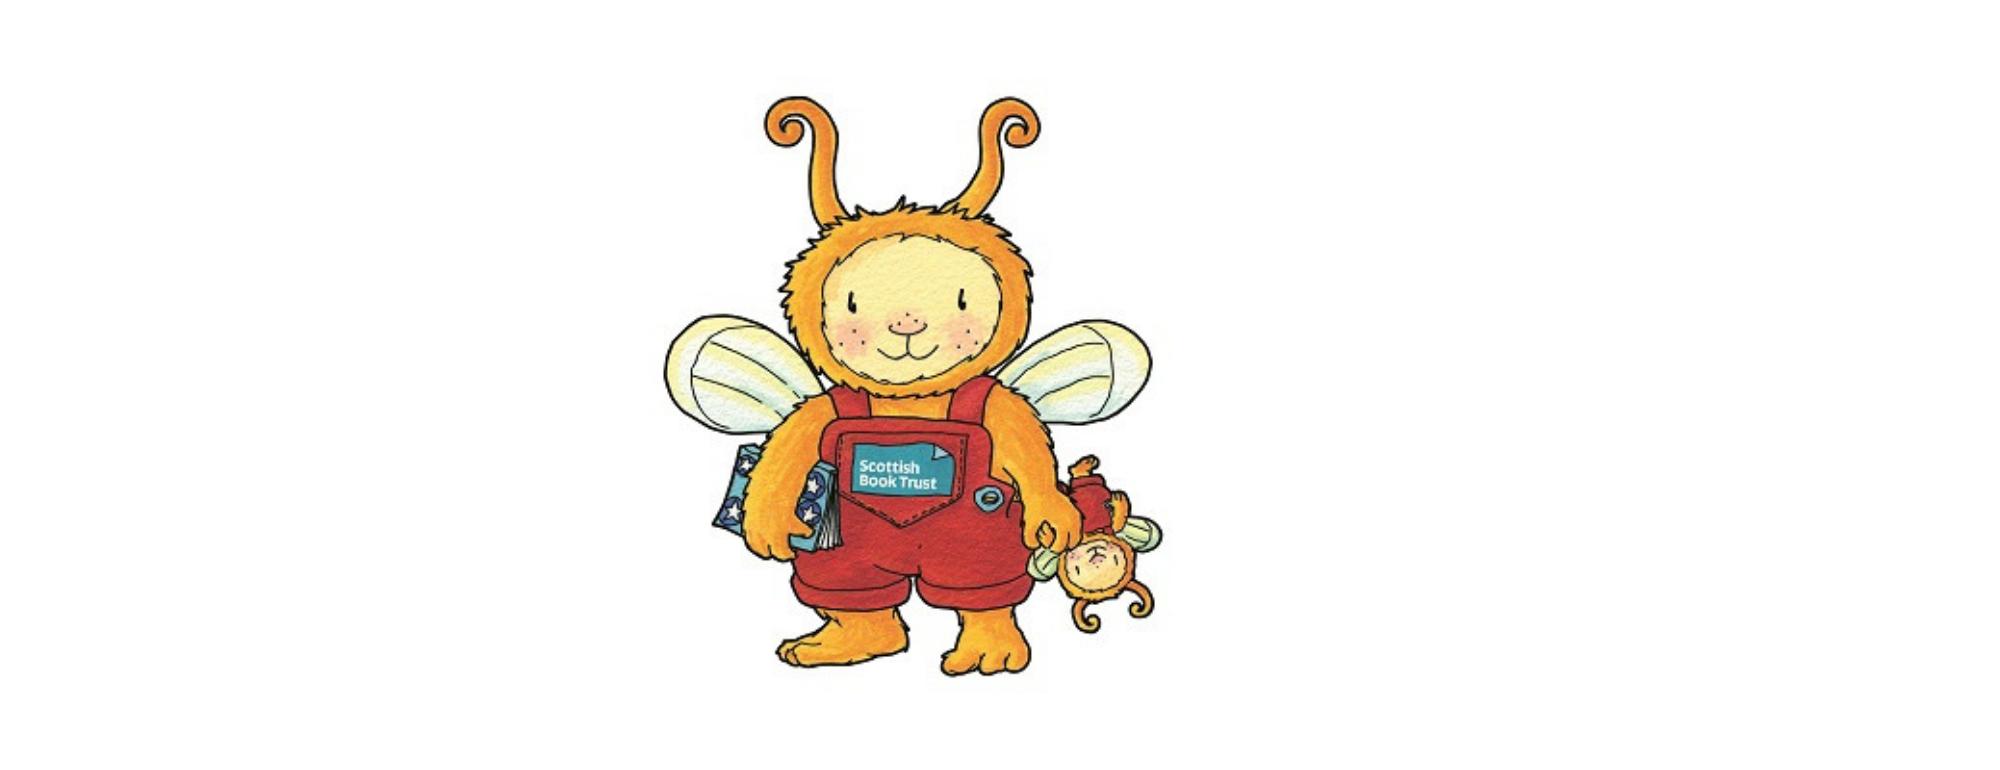 2000x770 bookbug middle